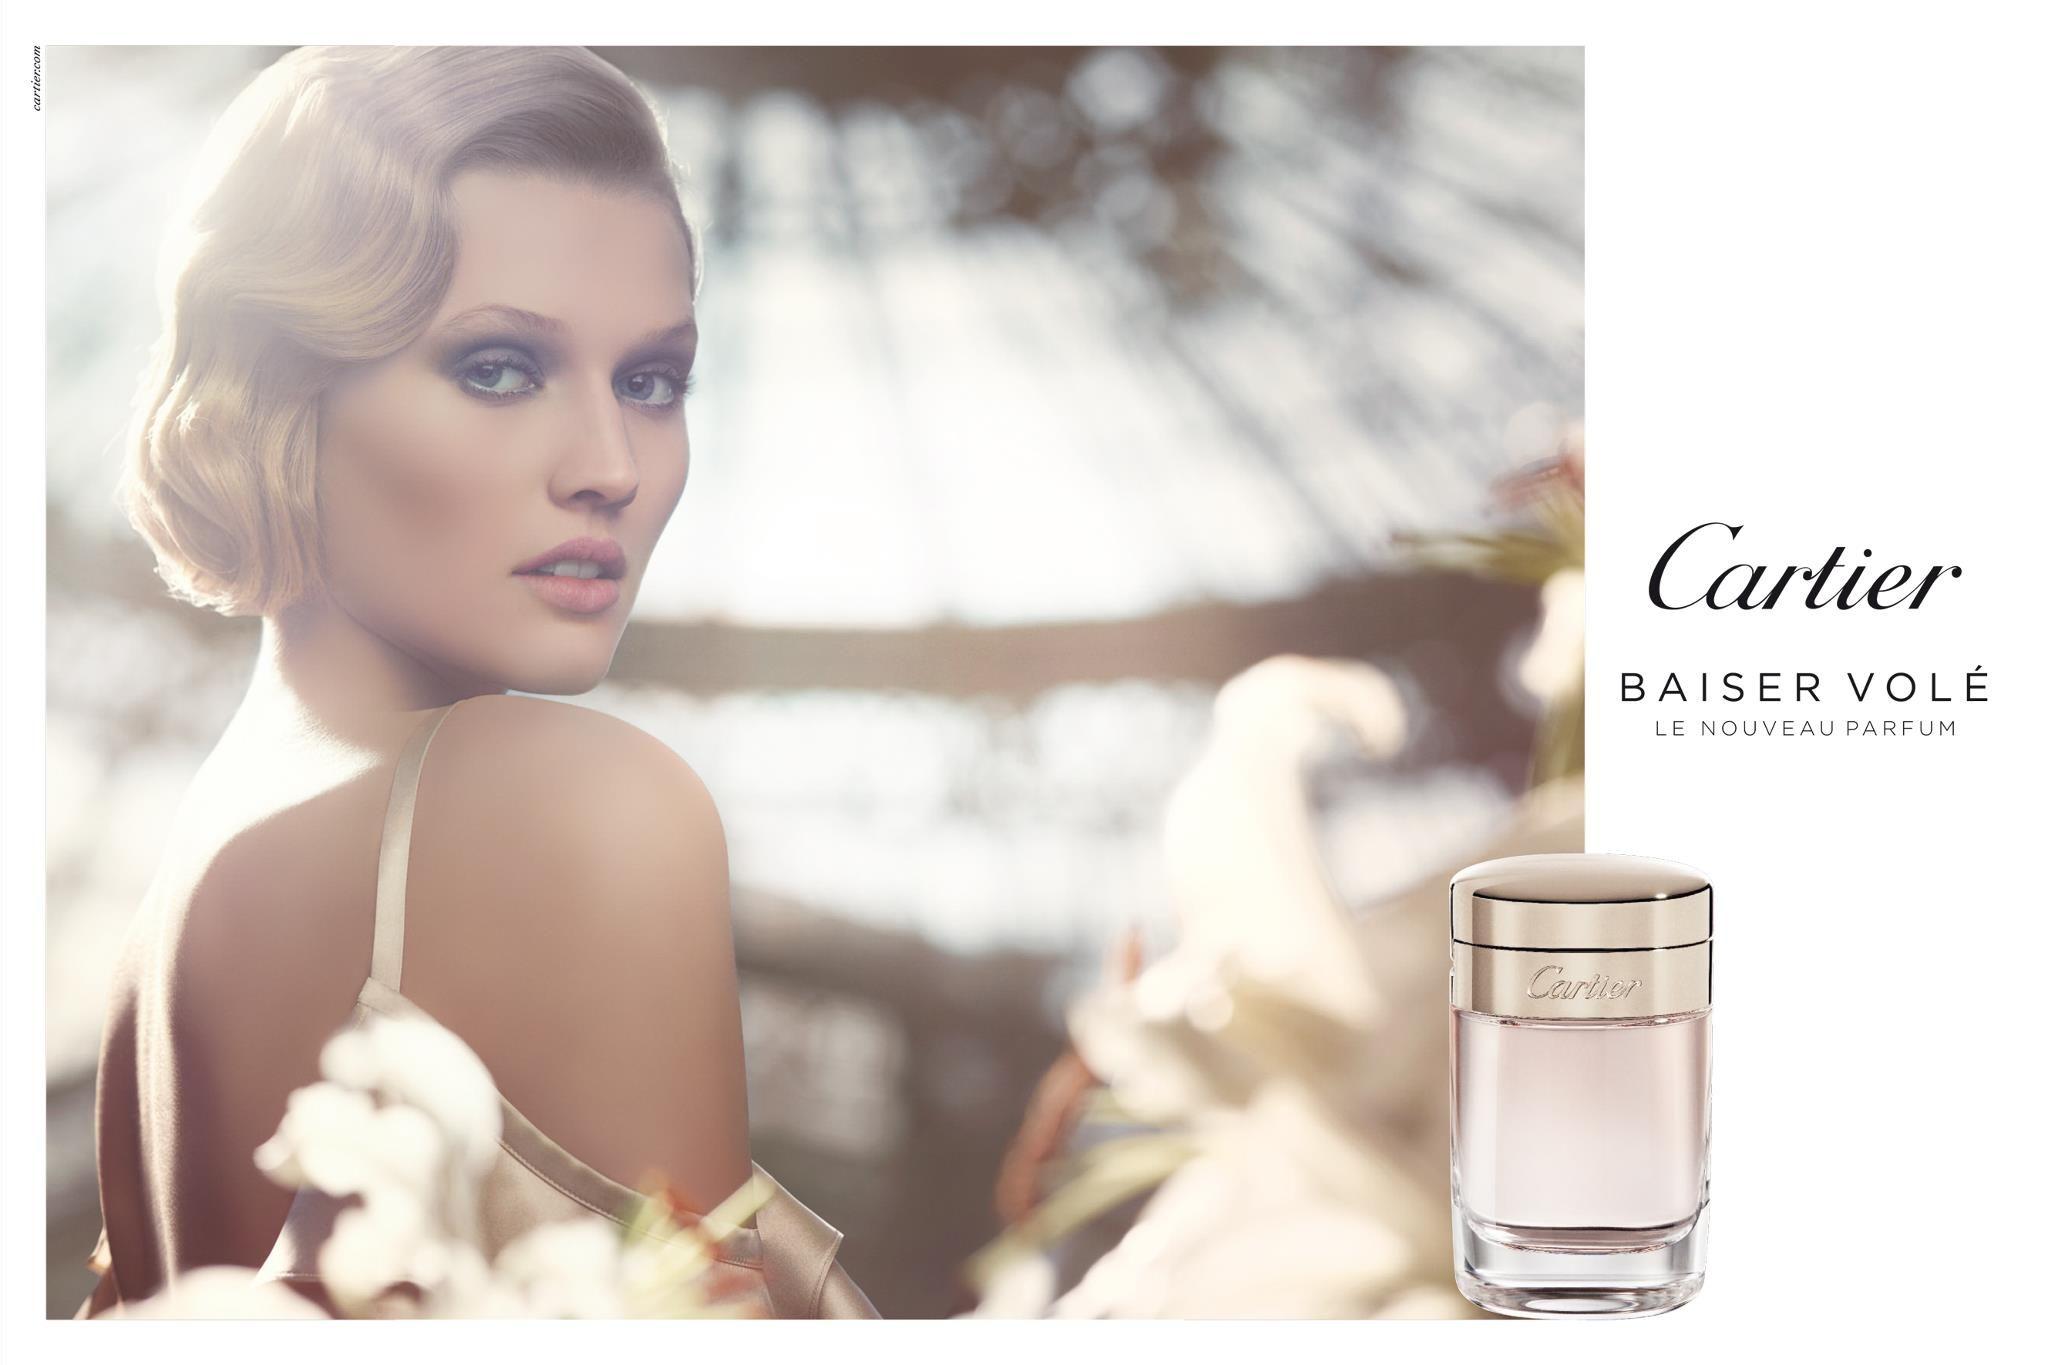 cartier parfum pub